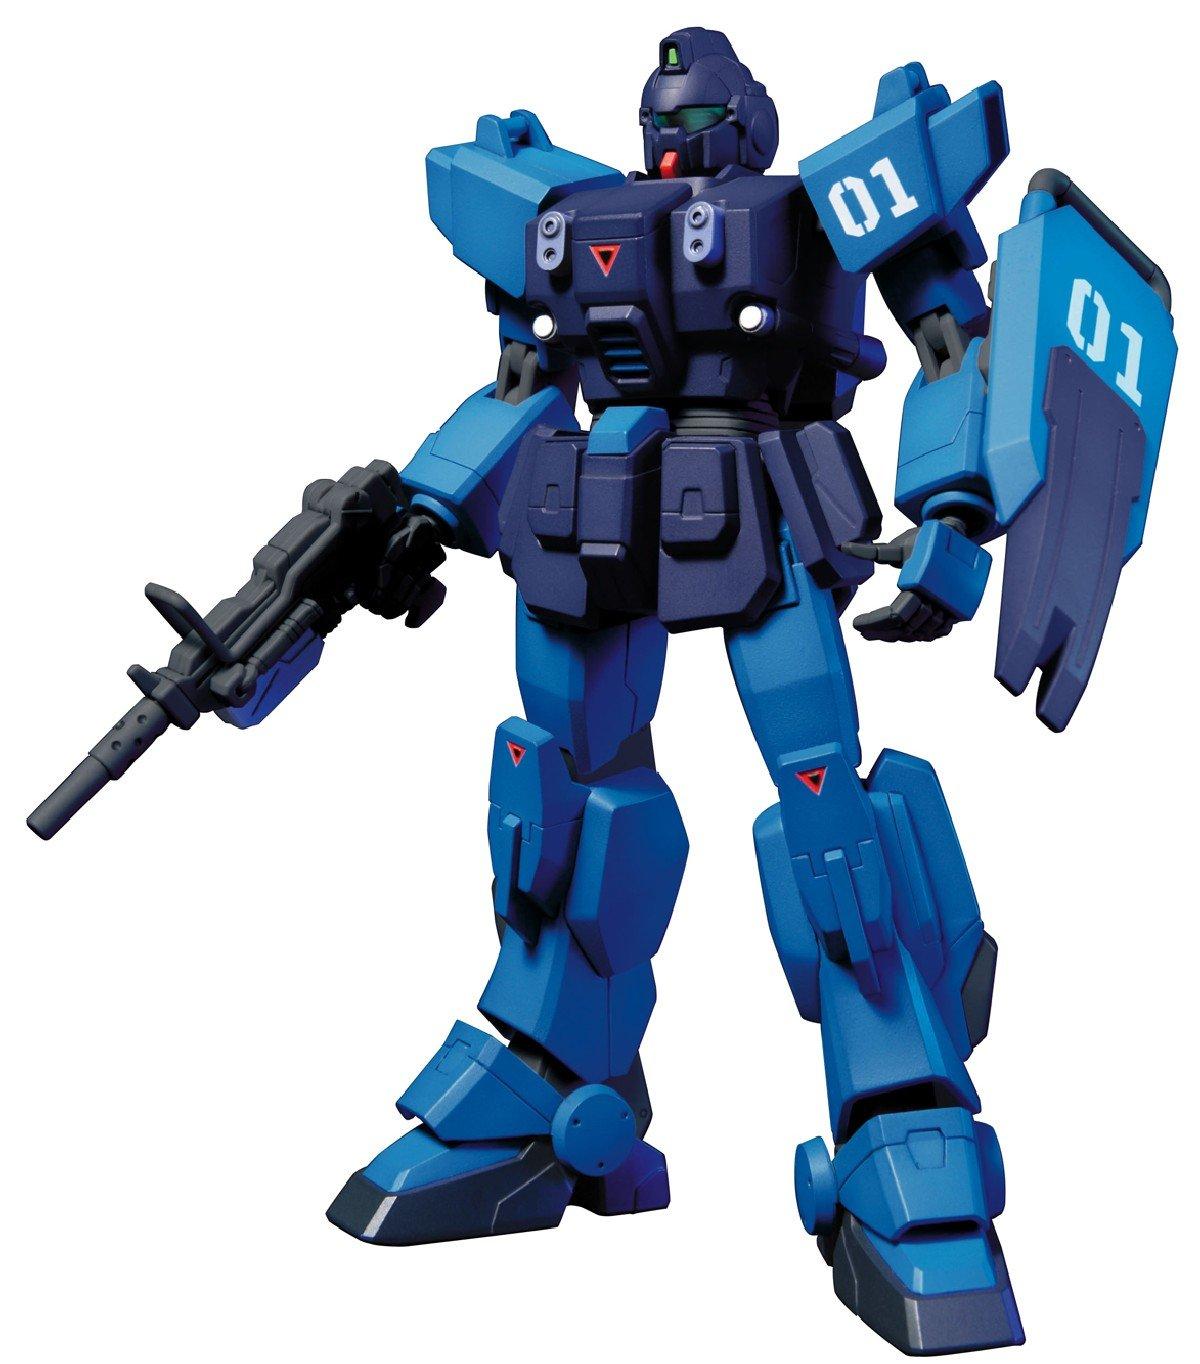 Bandai Hobby #80 RX-78BD-1 BLUE DESTINY UNIT 1, Bandai HGUC Action Figure